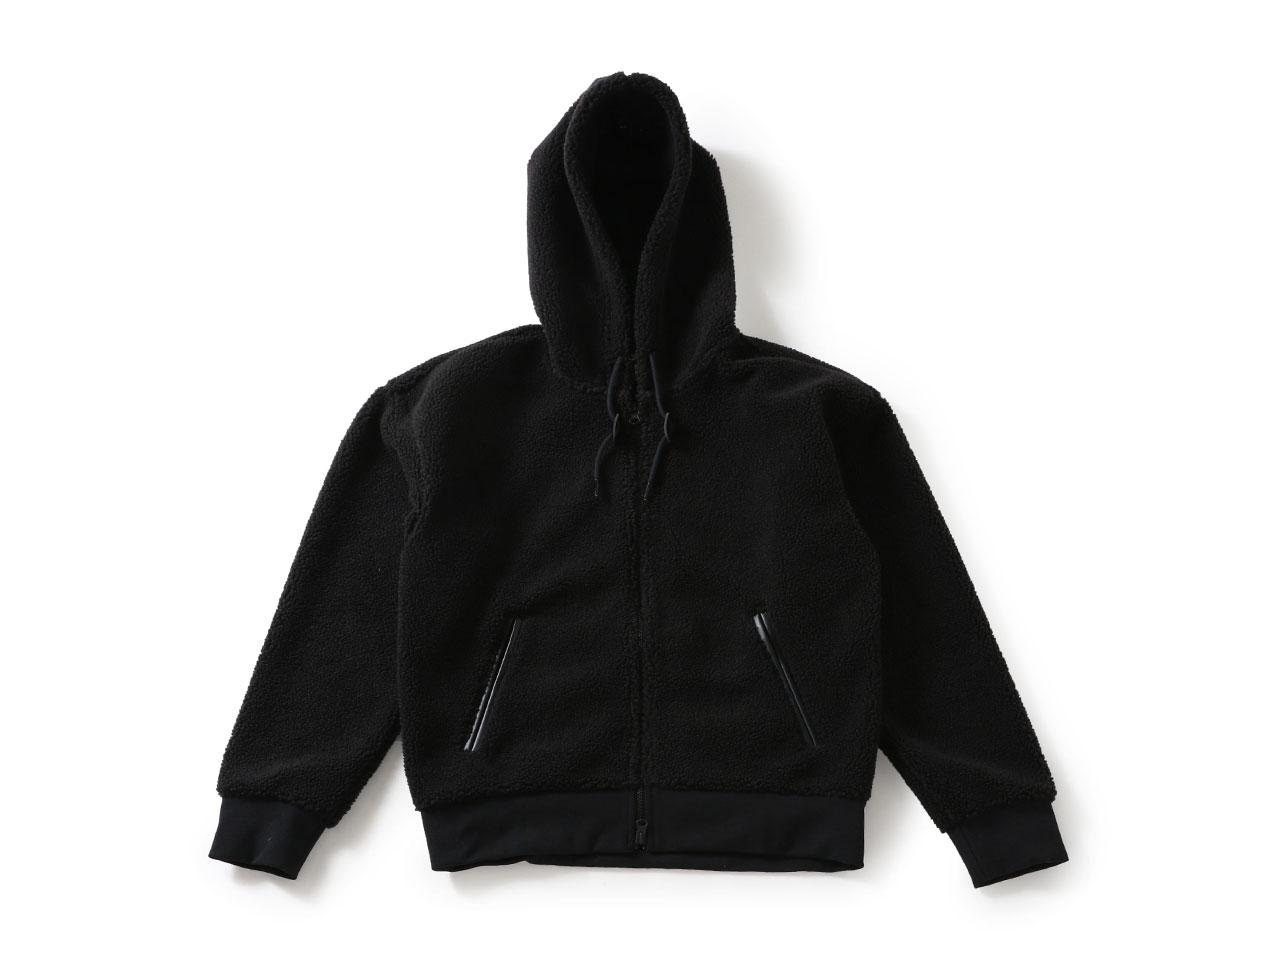 NIKE SB SHERPA HOODIE(CJ6601-010)【ナイキ】【メンズファッション】【トップス】【フードパーカー】【ストリート】【スポーツ】